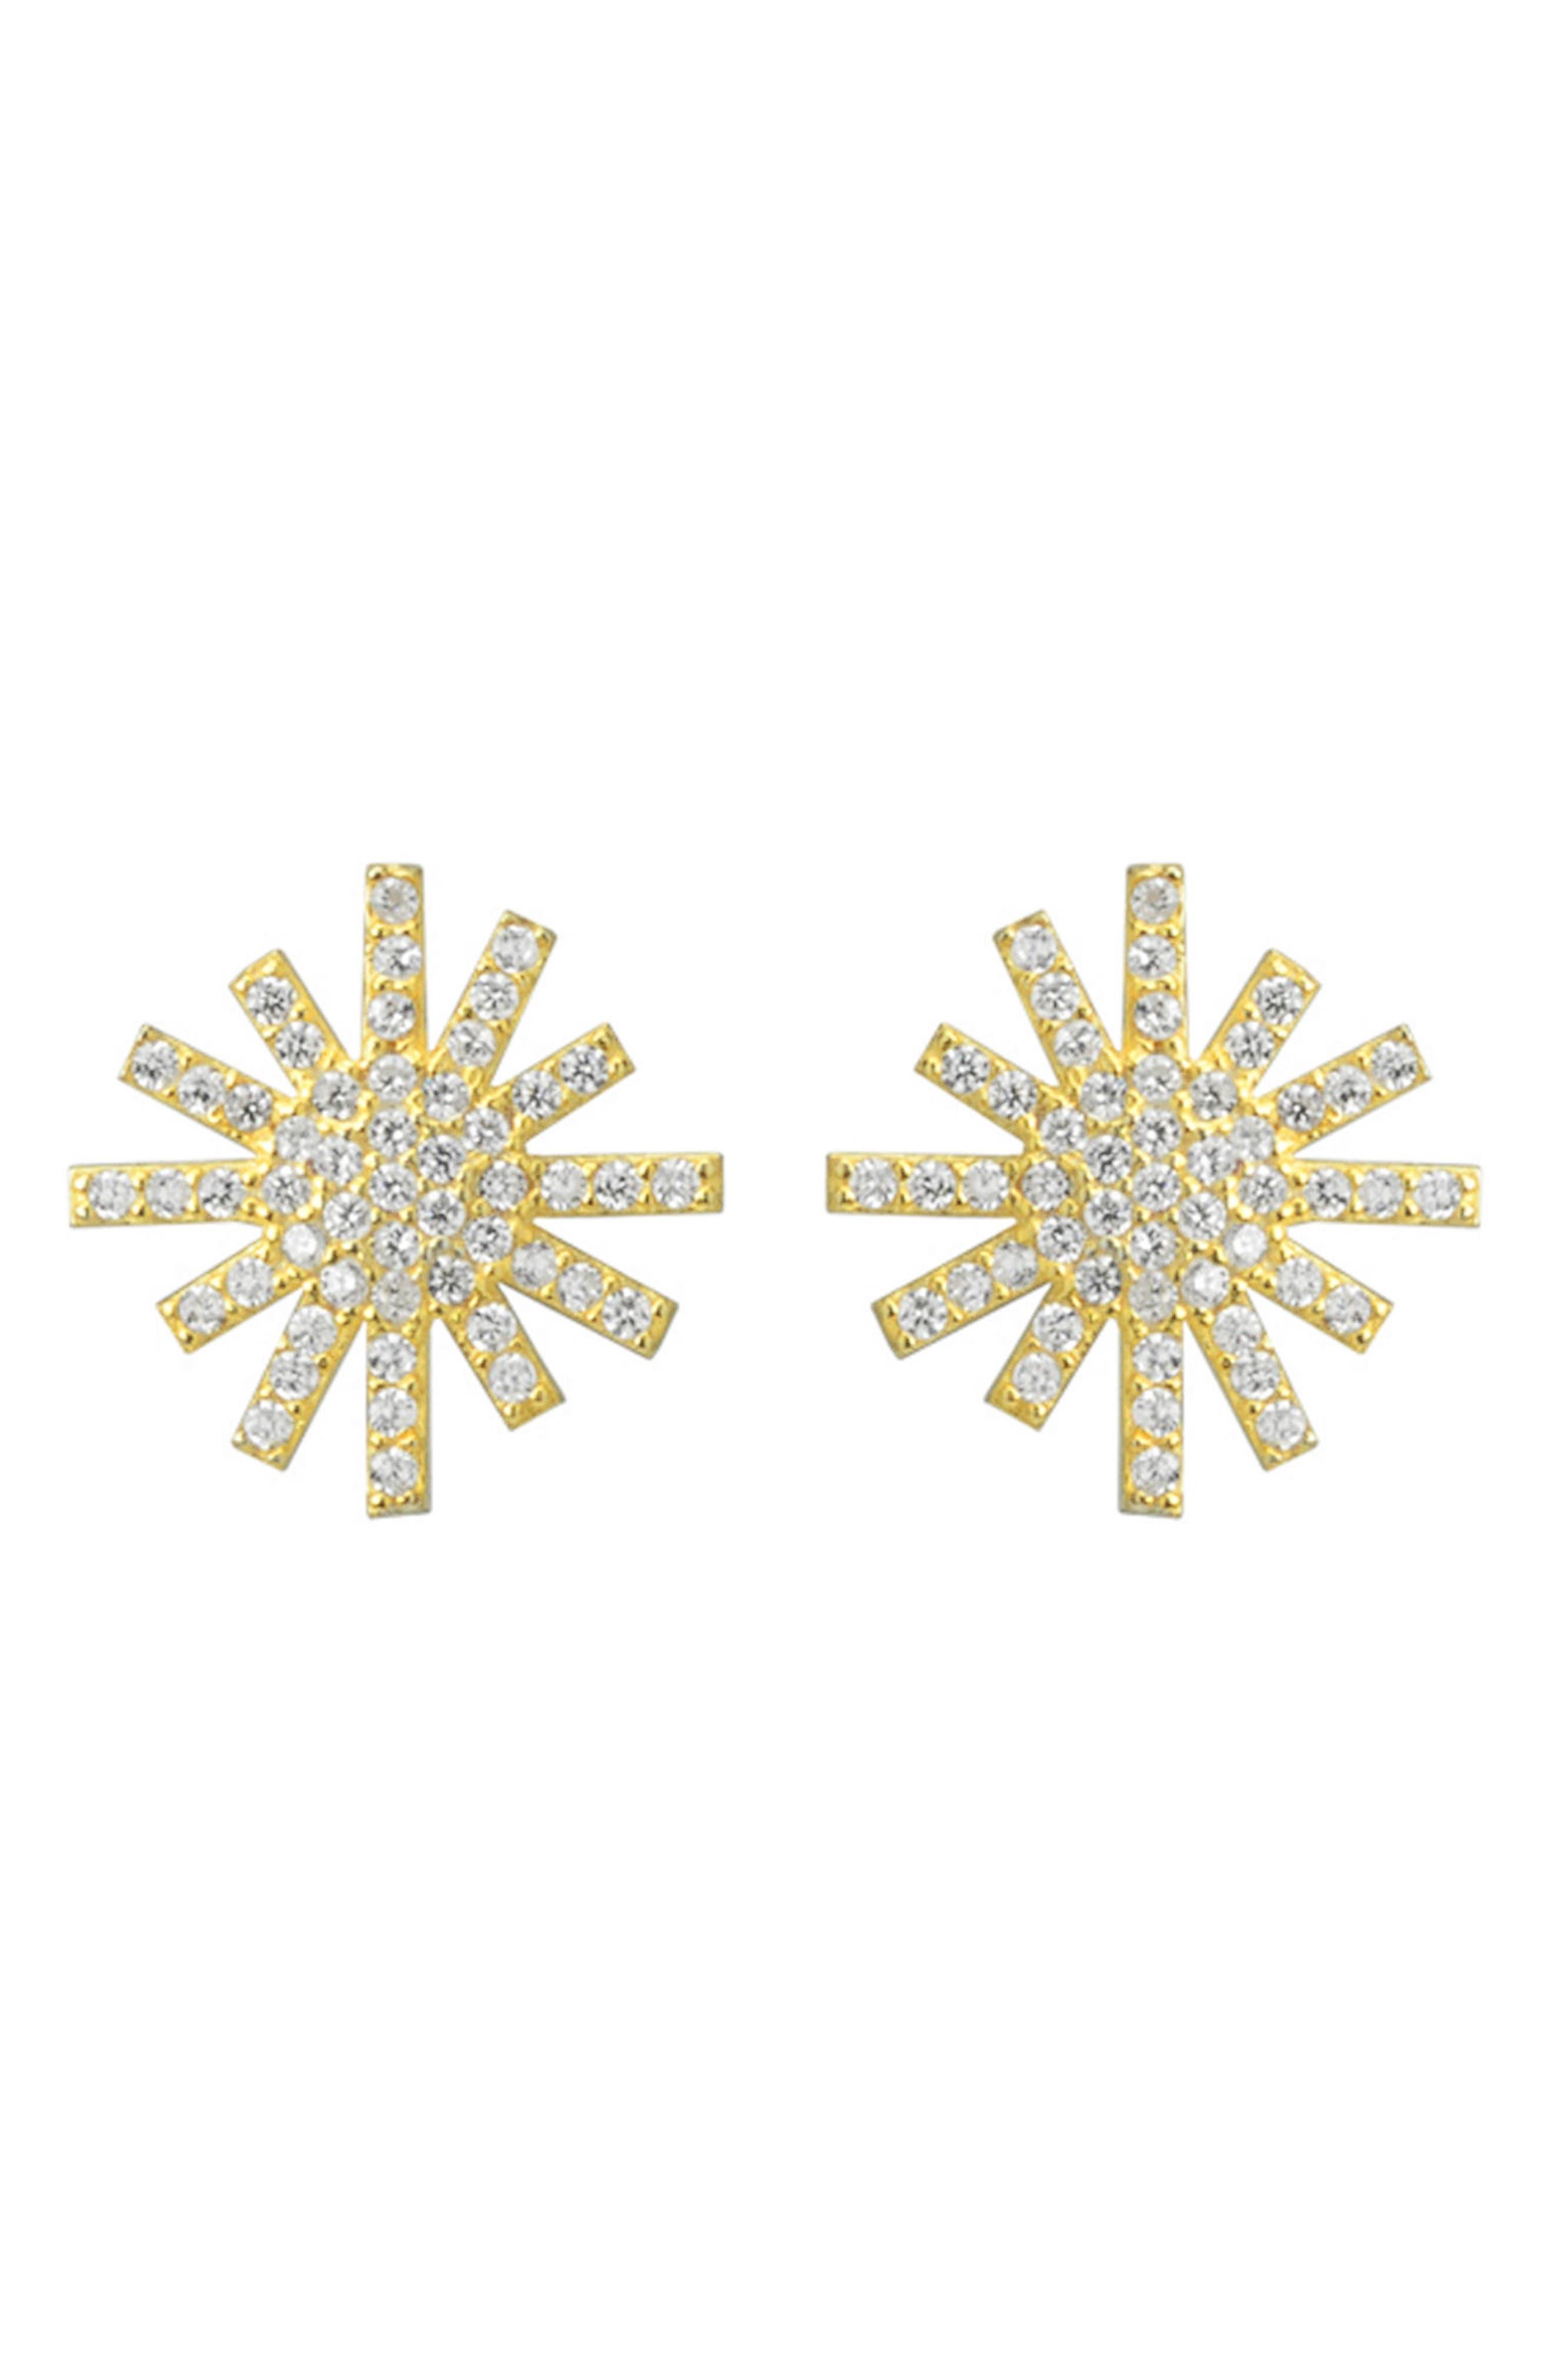 Starburst Stud Earrings,                         Main,                         color, Metallic Gold